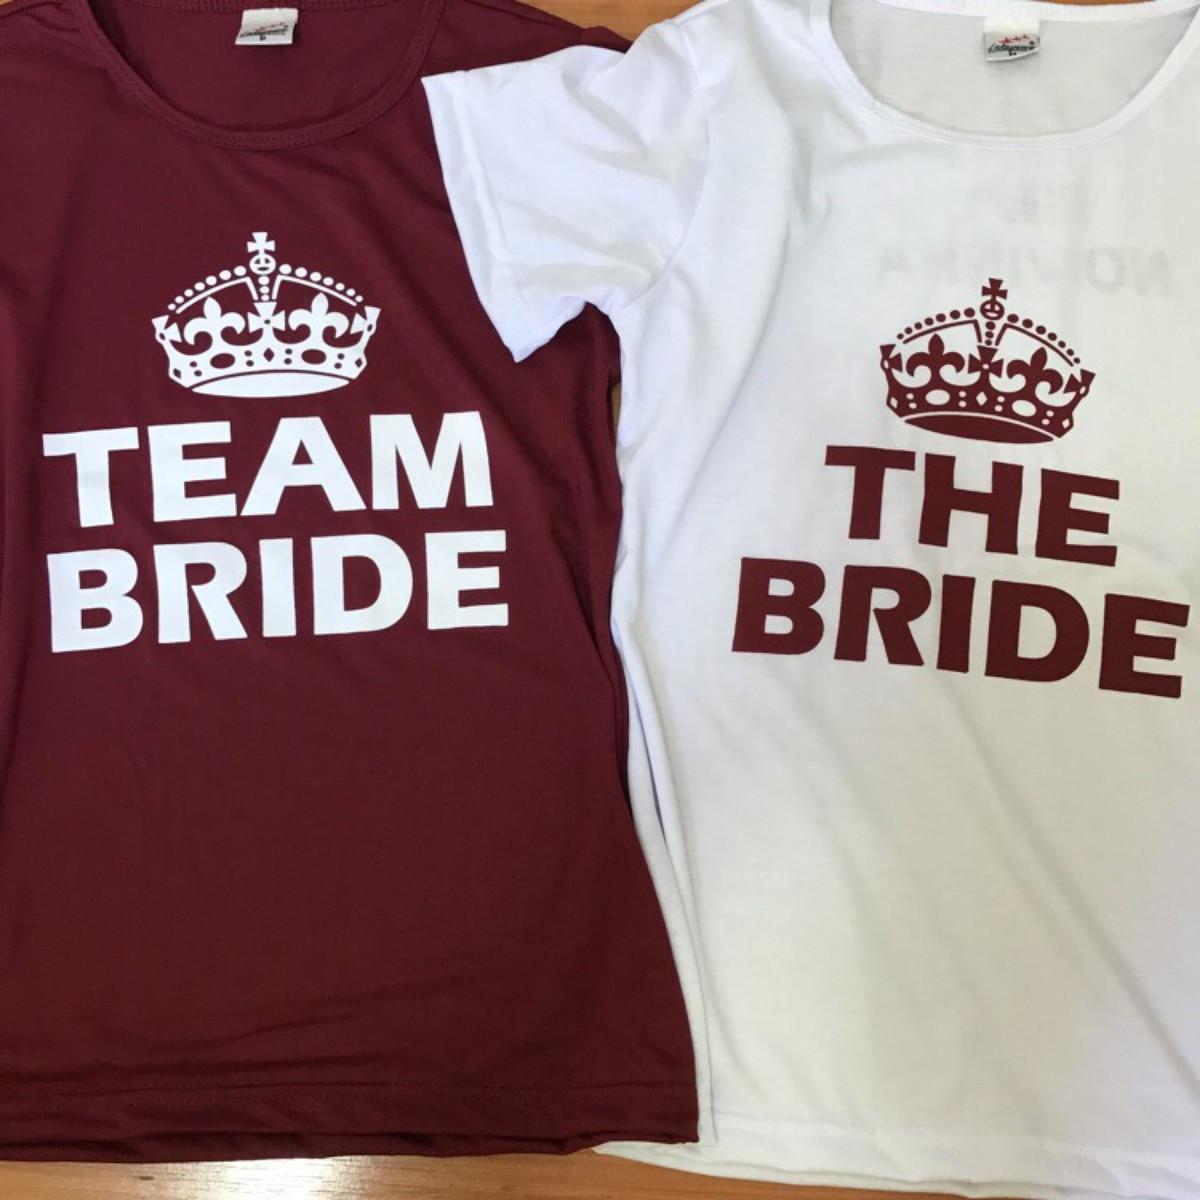 ba44571bda Camiseta Despedida Solteira Team Bride no Elo7